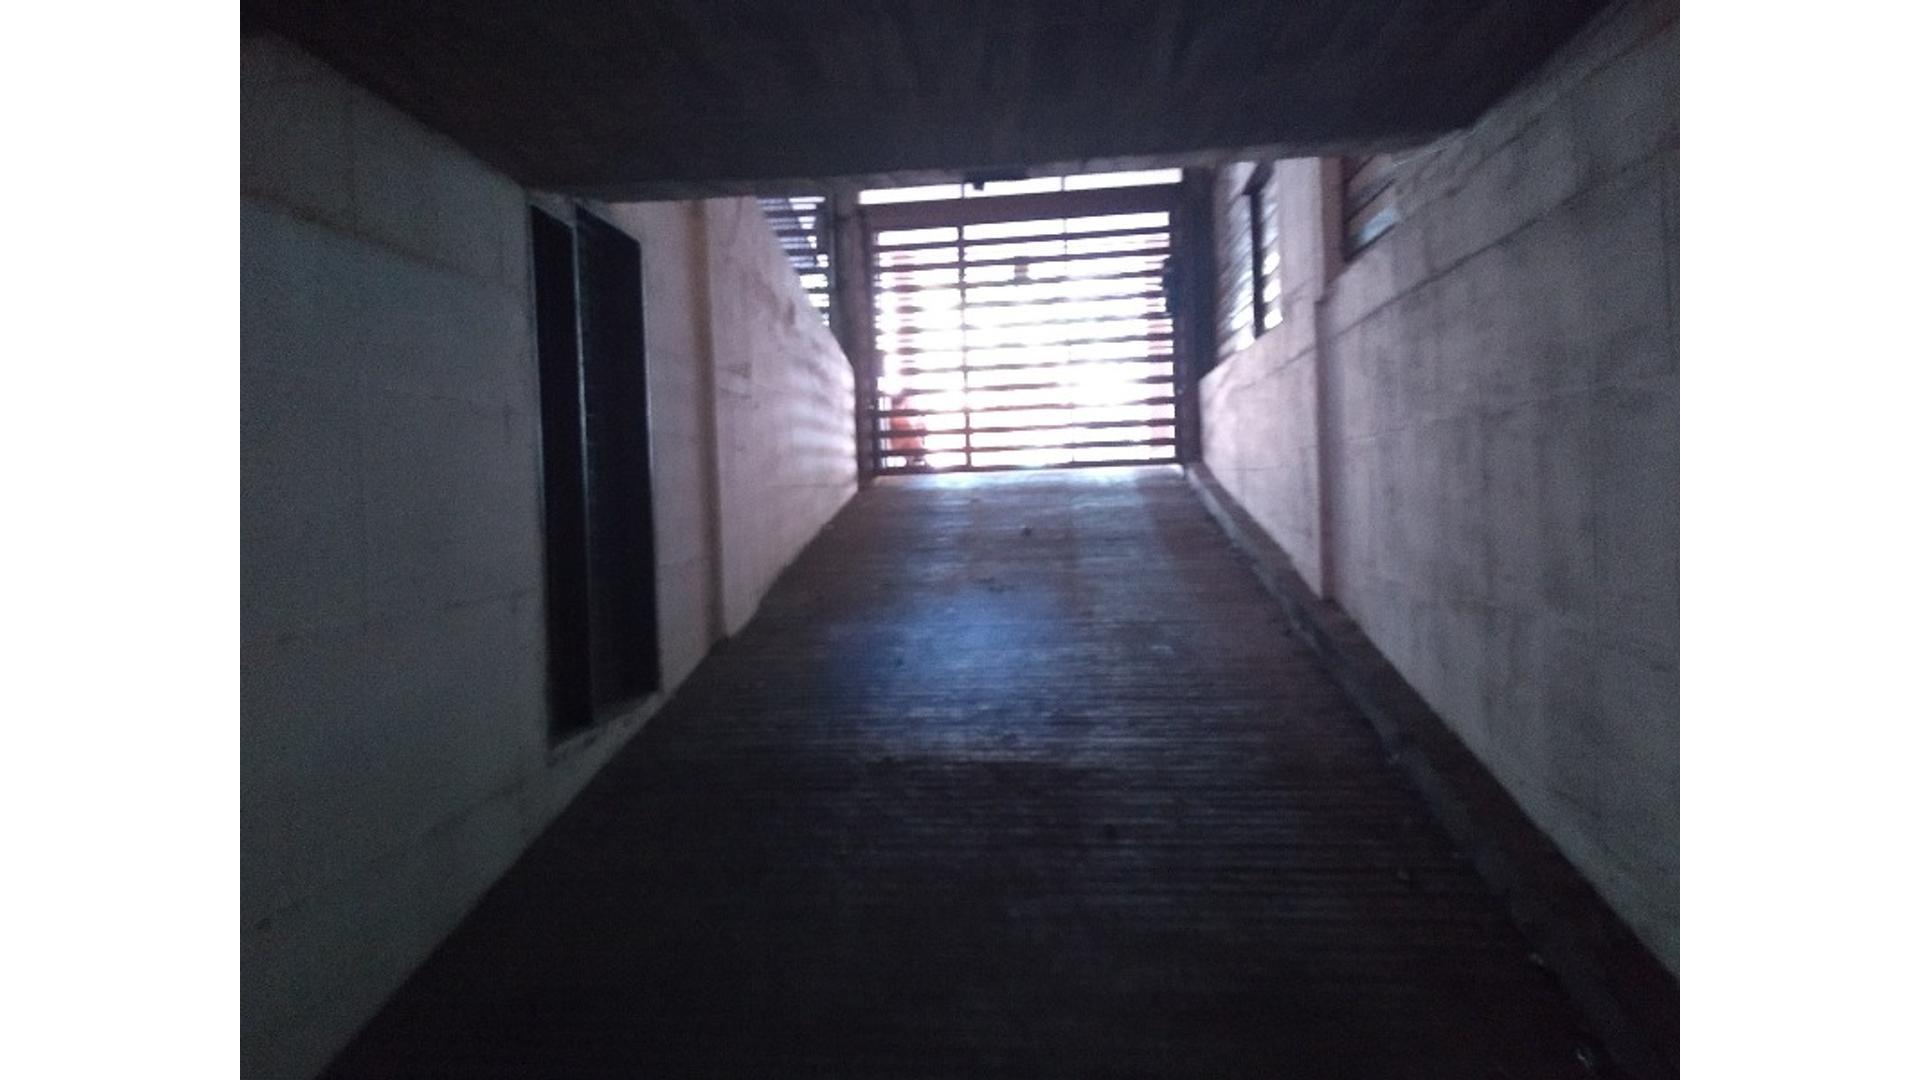 Avenida Velez Sarsfield 800 - U$D 19.800 - Cochera en Venta